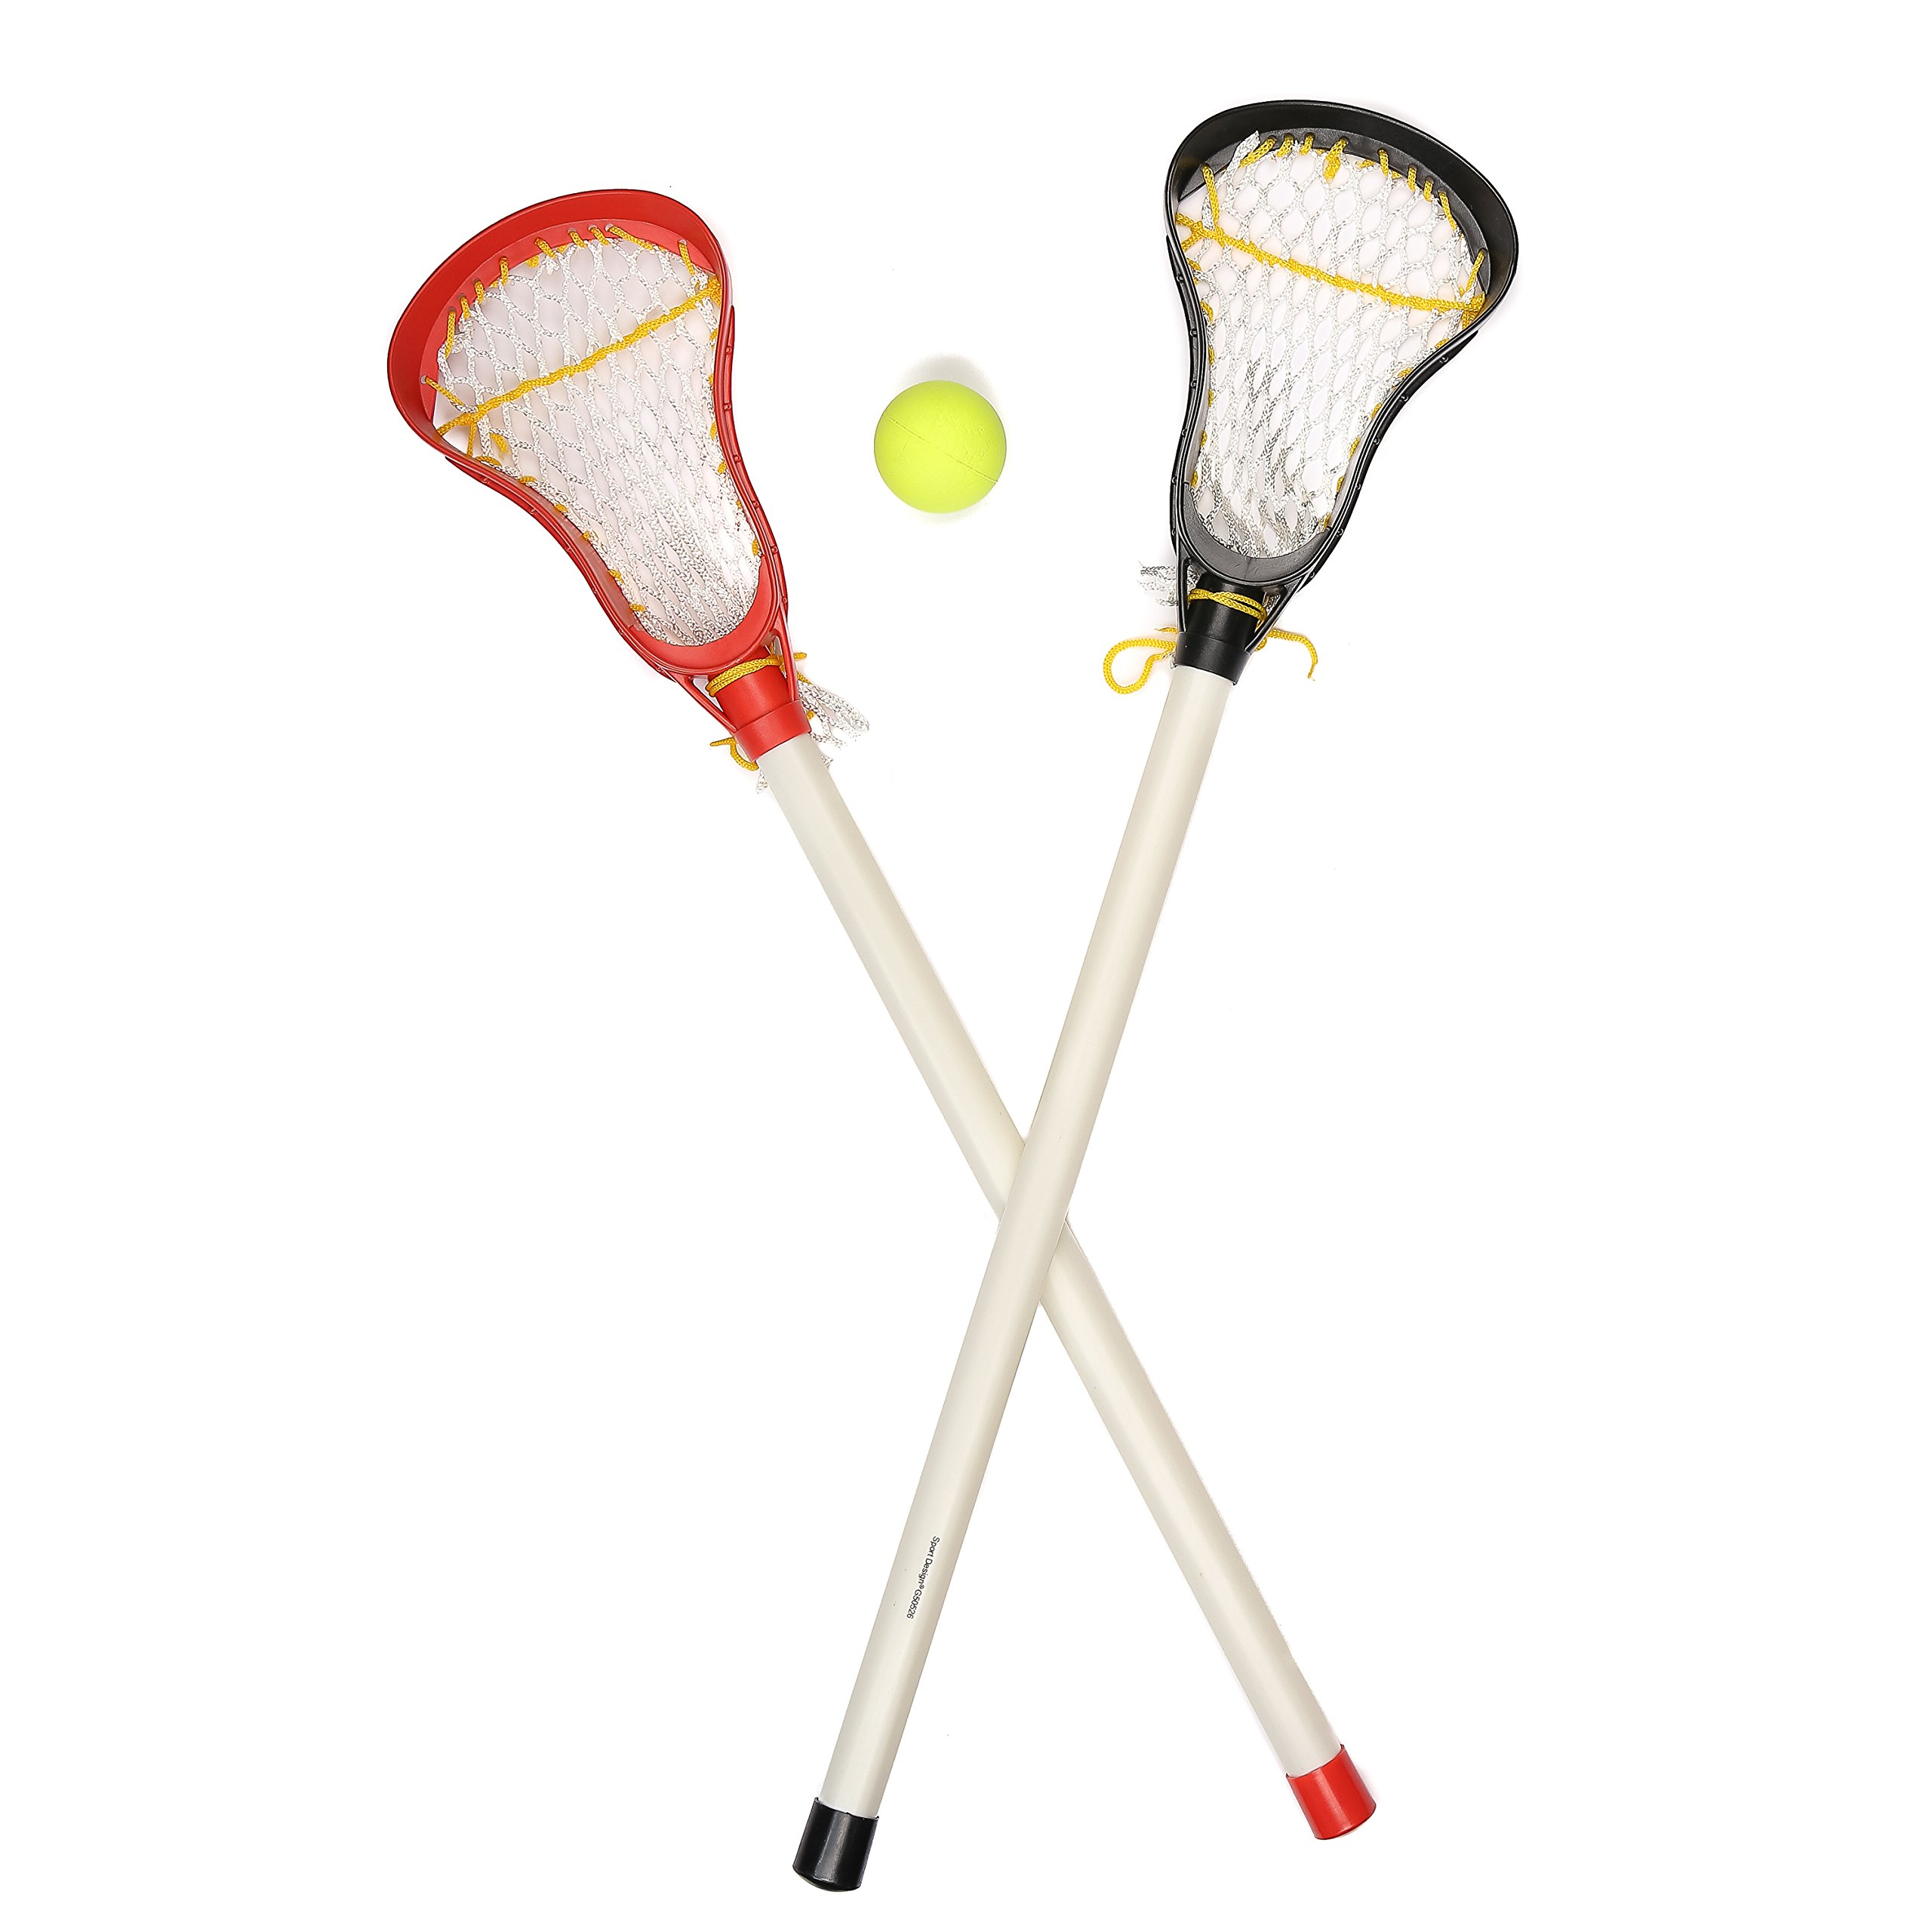 Kids Lacrosse Sticks - 2 Sticks (30 Inches) & 1 Ball - Soft Mesh Pockets, Durable Plastic Handles, & Large Head Design